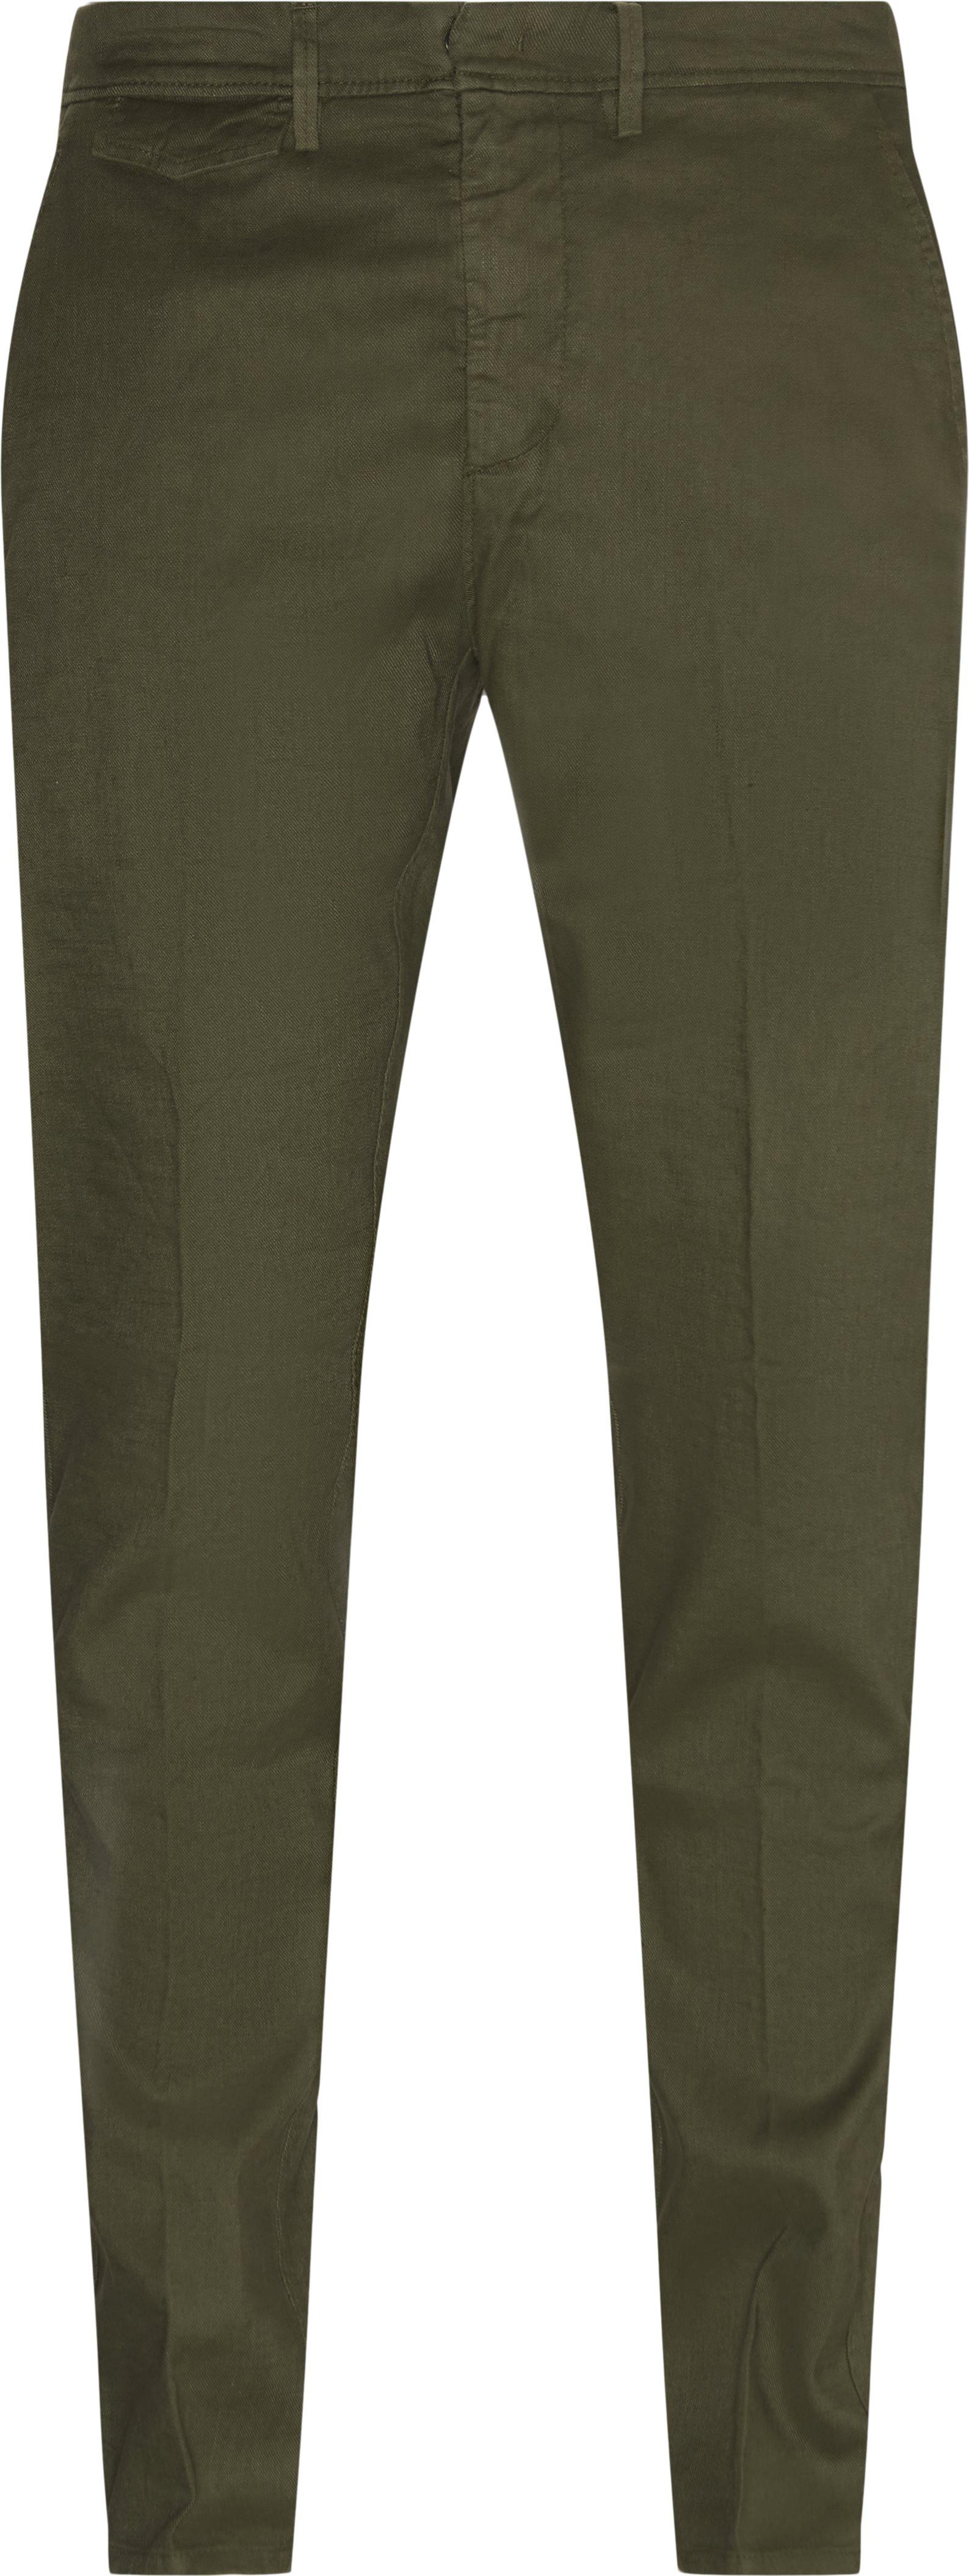 Chinos  - Bukser - Regular fit - Army